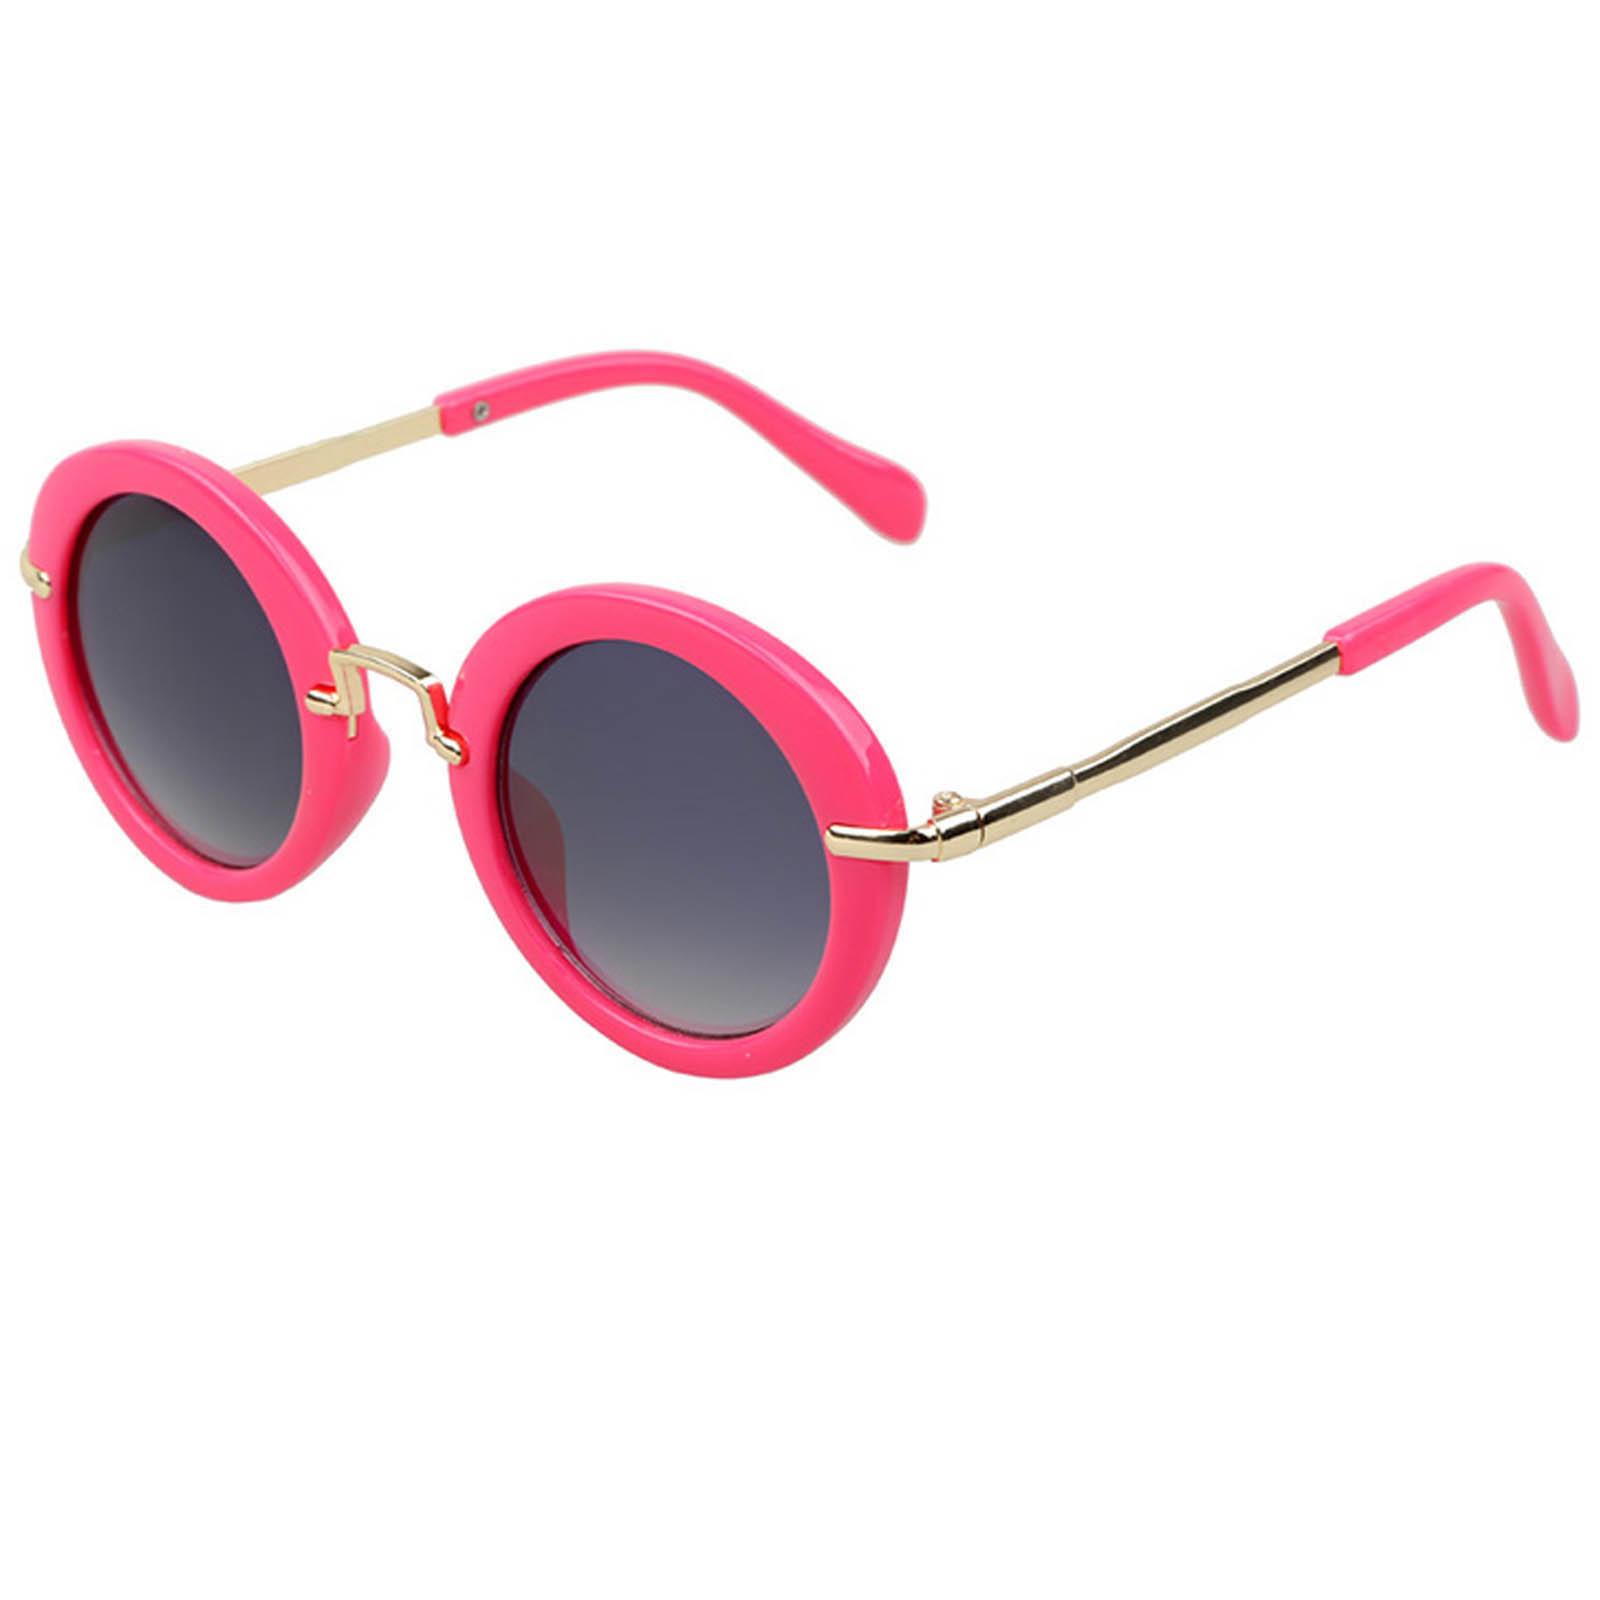 OWL ® 045 C4 Round Eyewear Sunglasses Women\'s Men\'s Metal Round ...